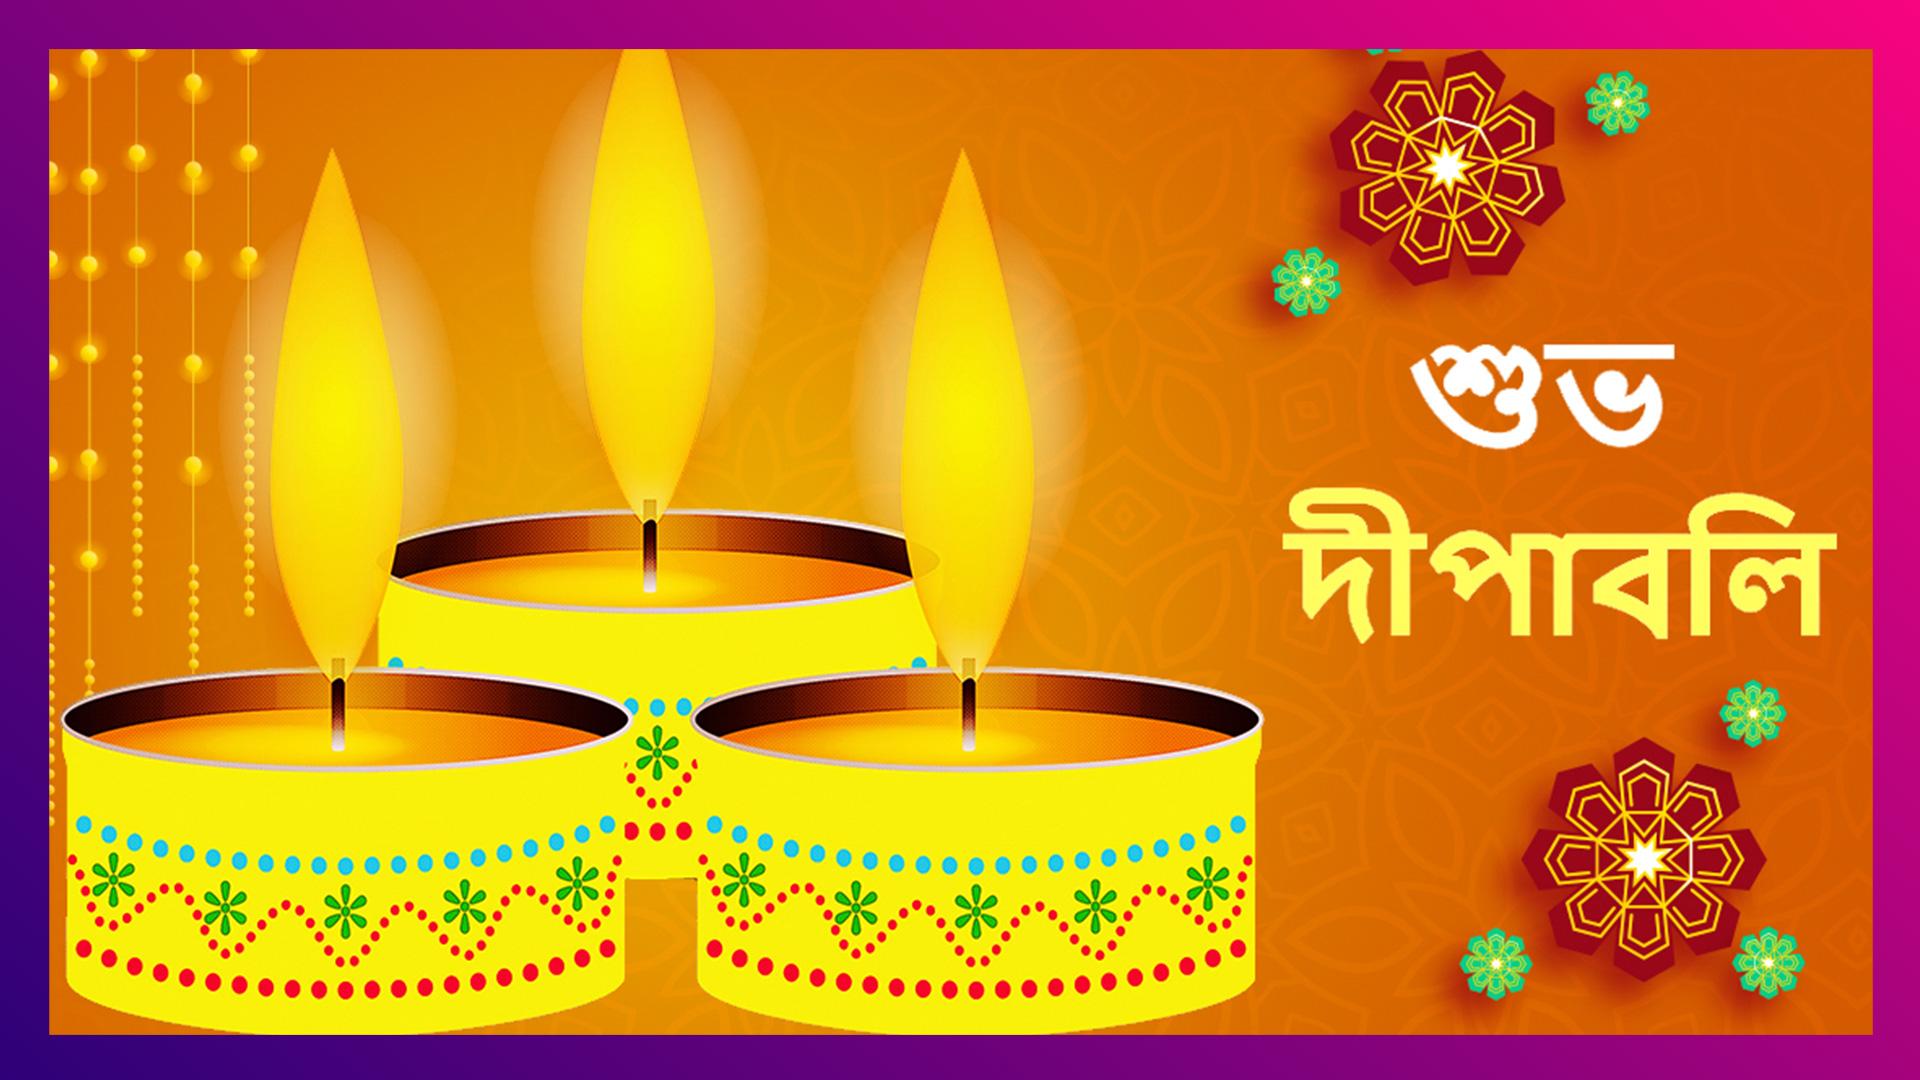 Happy Diwali 2020 Wishes: শুভ দীপাবলির শুভেচ্ছা জানান এই বাংলা শুভেচ্ছাপত্রগুলি শেয়ার করে